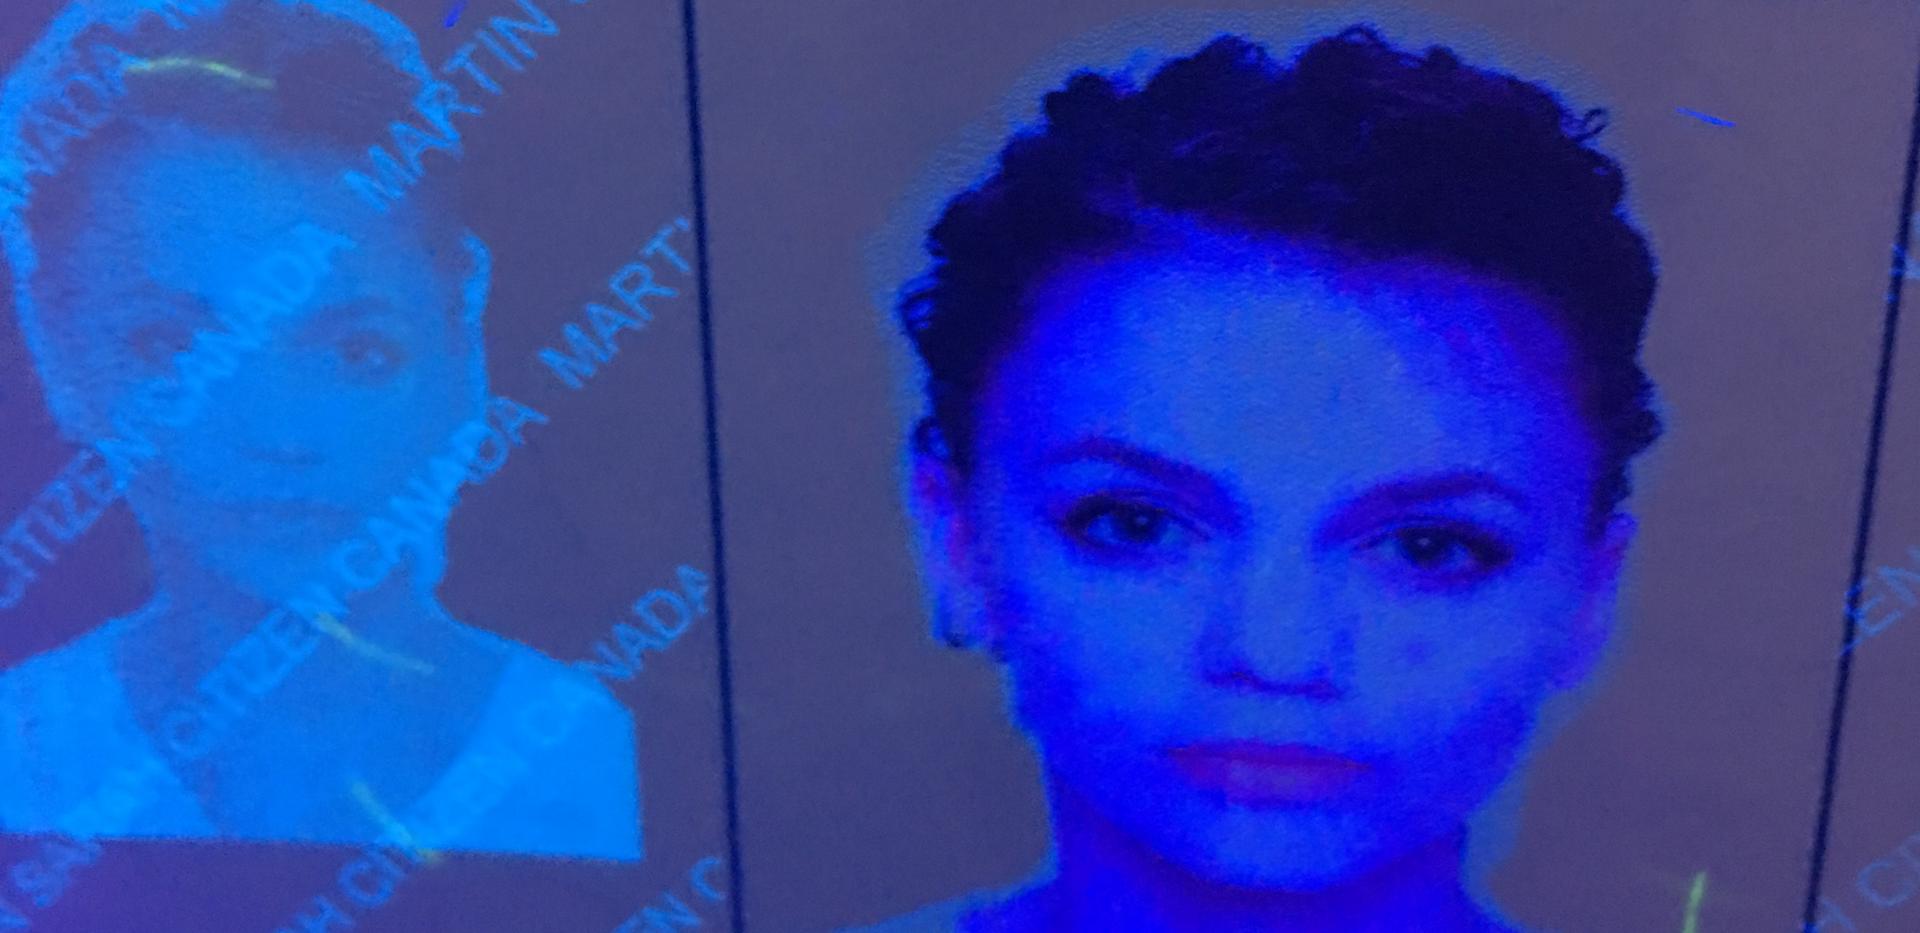 UV Shadow Image.png